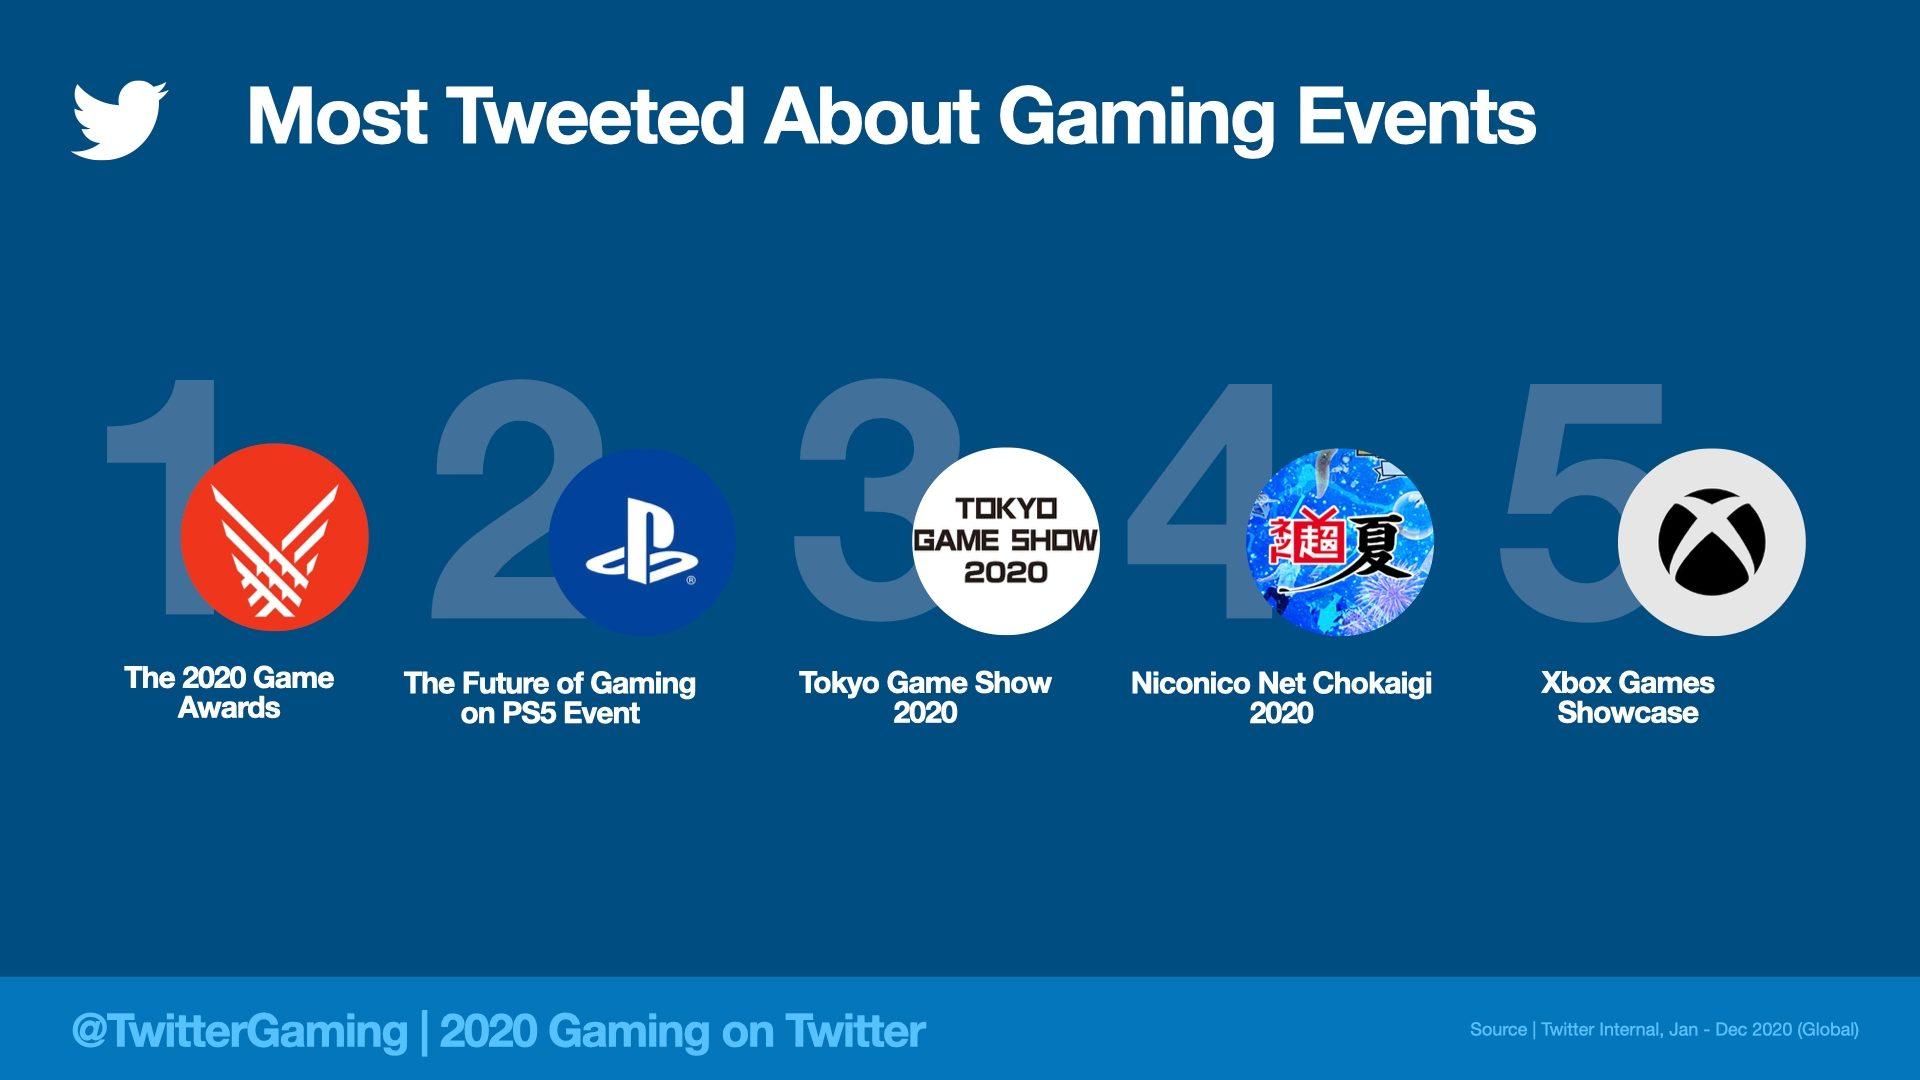 Twitter 2020 Evenement Jeu Vidéo